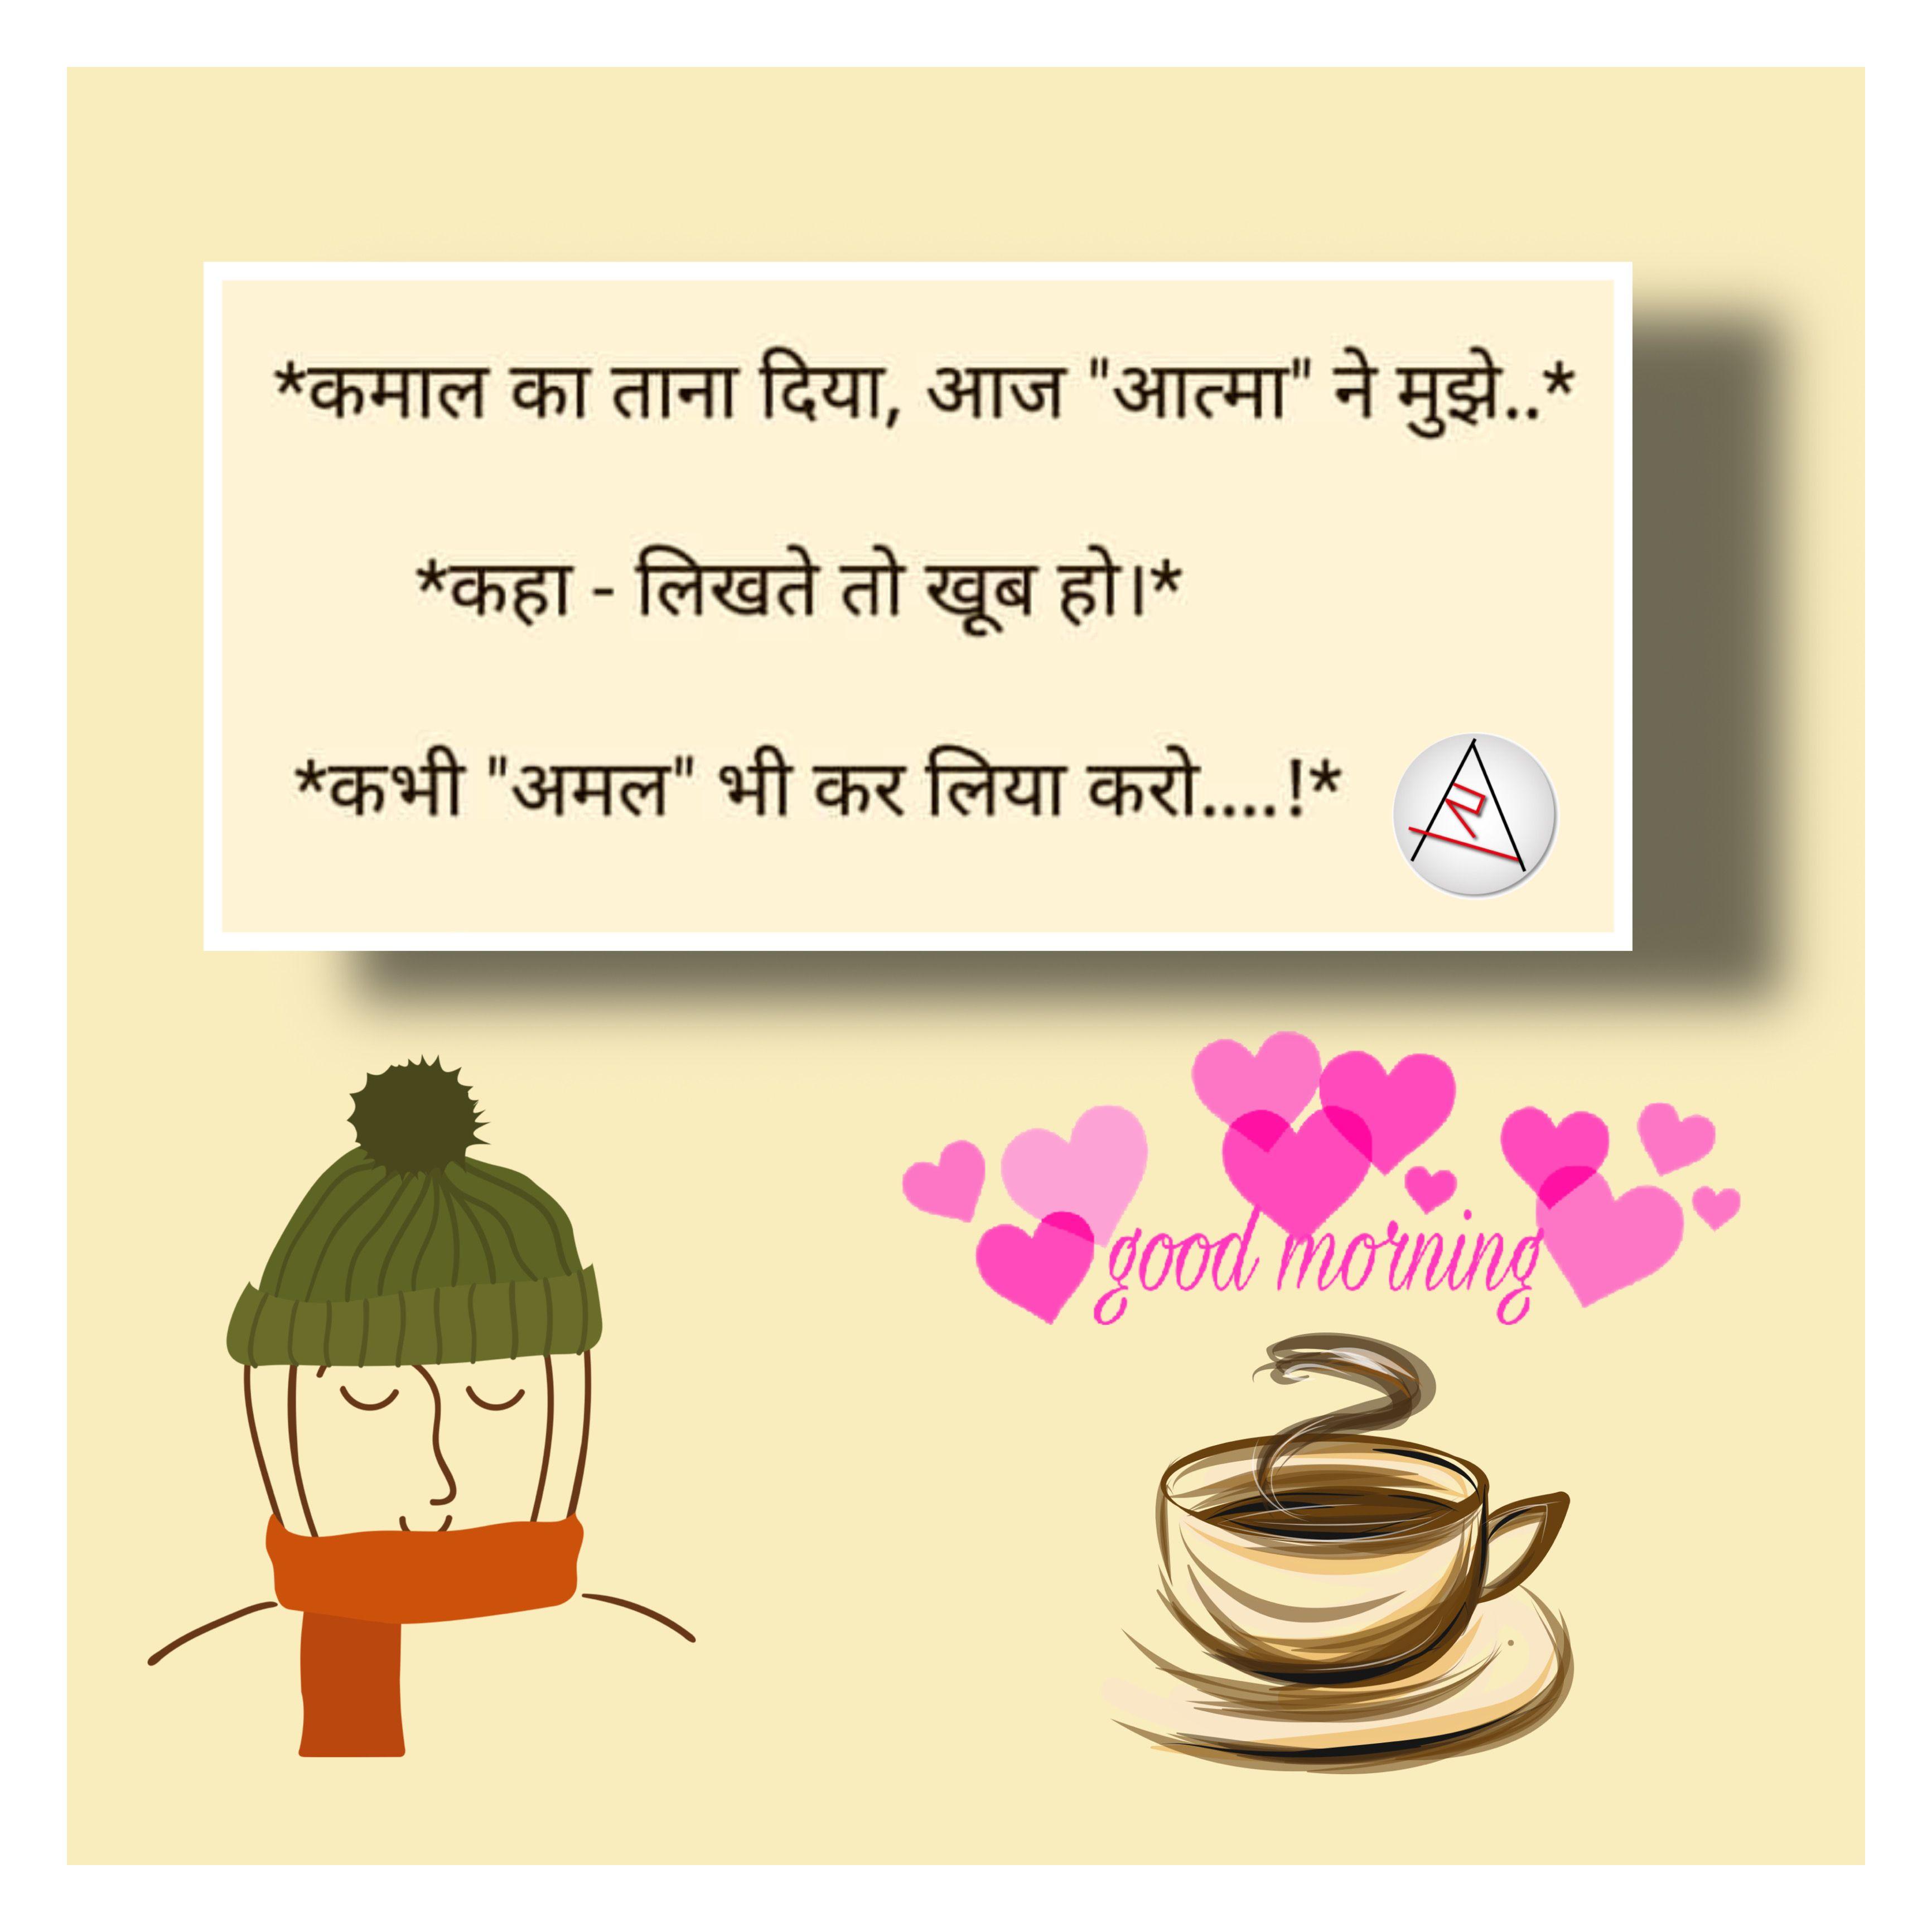 #freetoedit #goodmorning #morningquotes #art #ahlawatravi #morning #quotes #quotensaying #picsart #PicsArtStudio